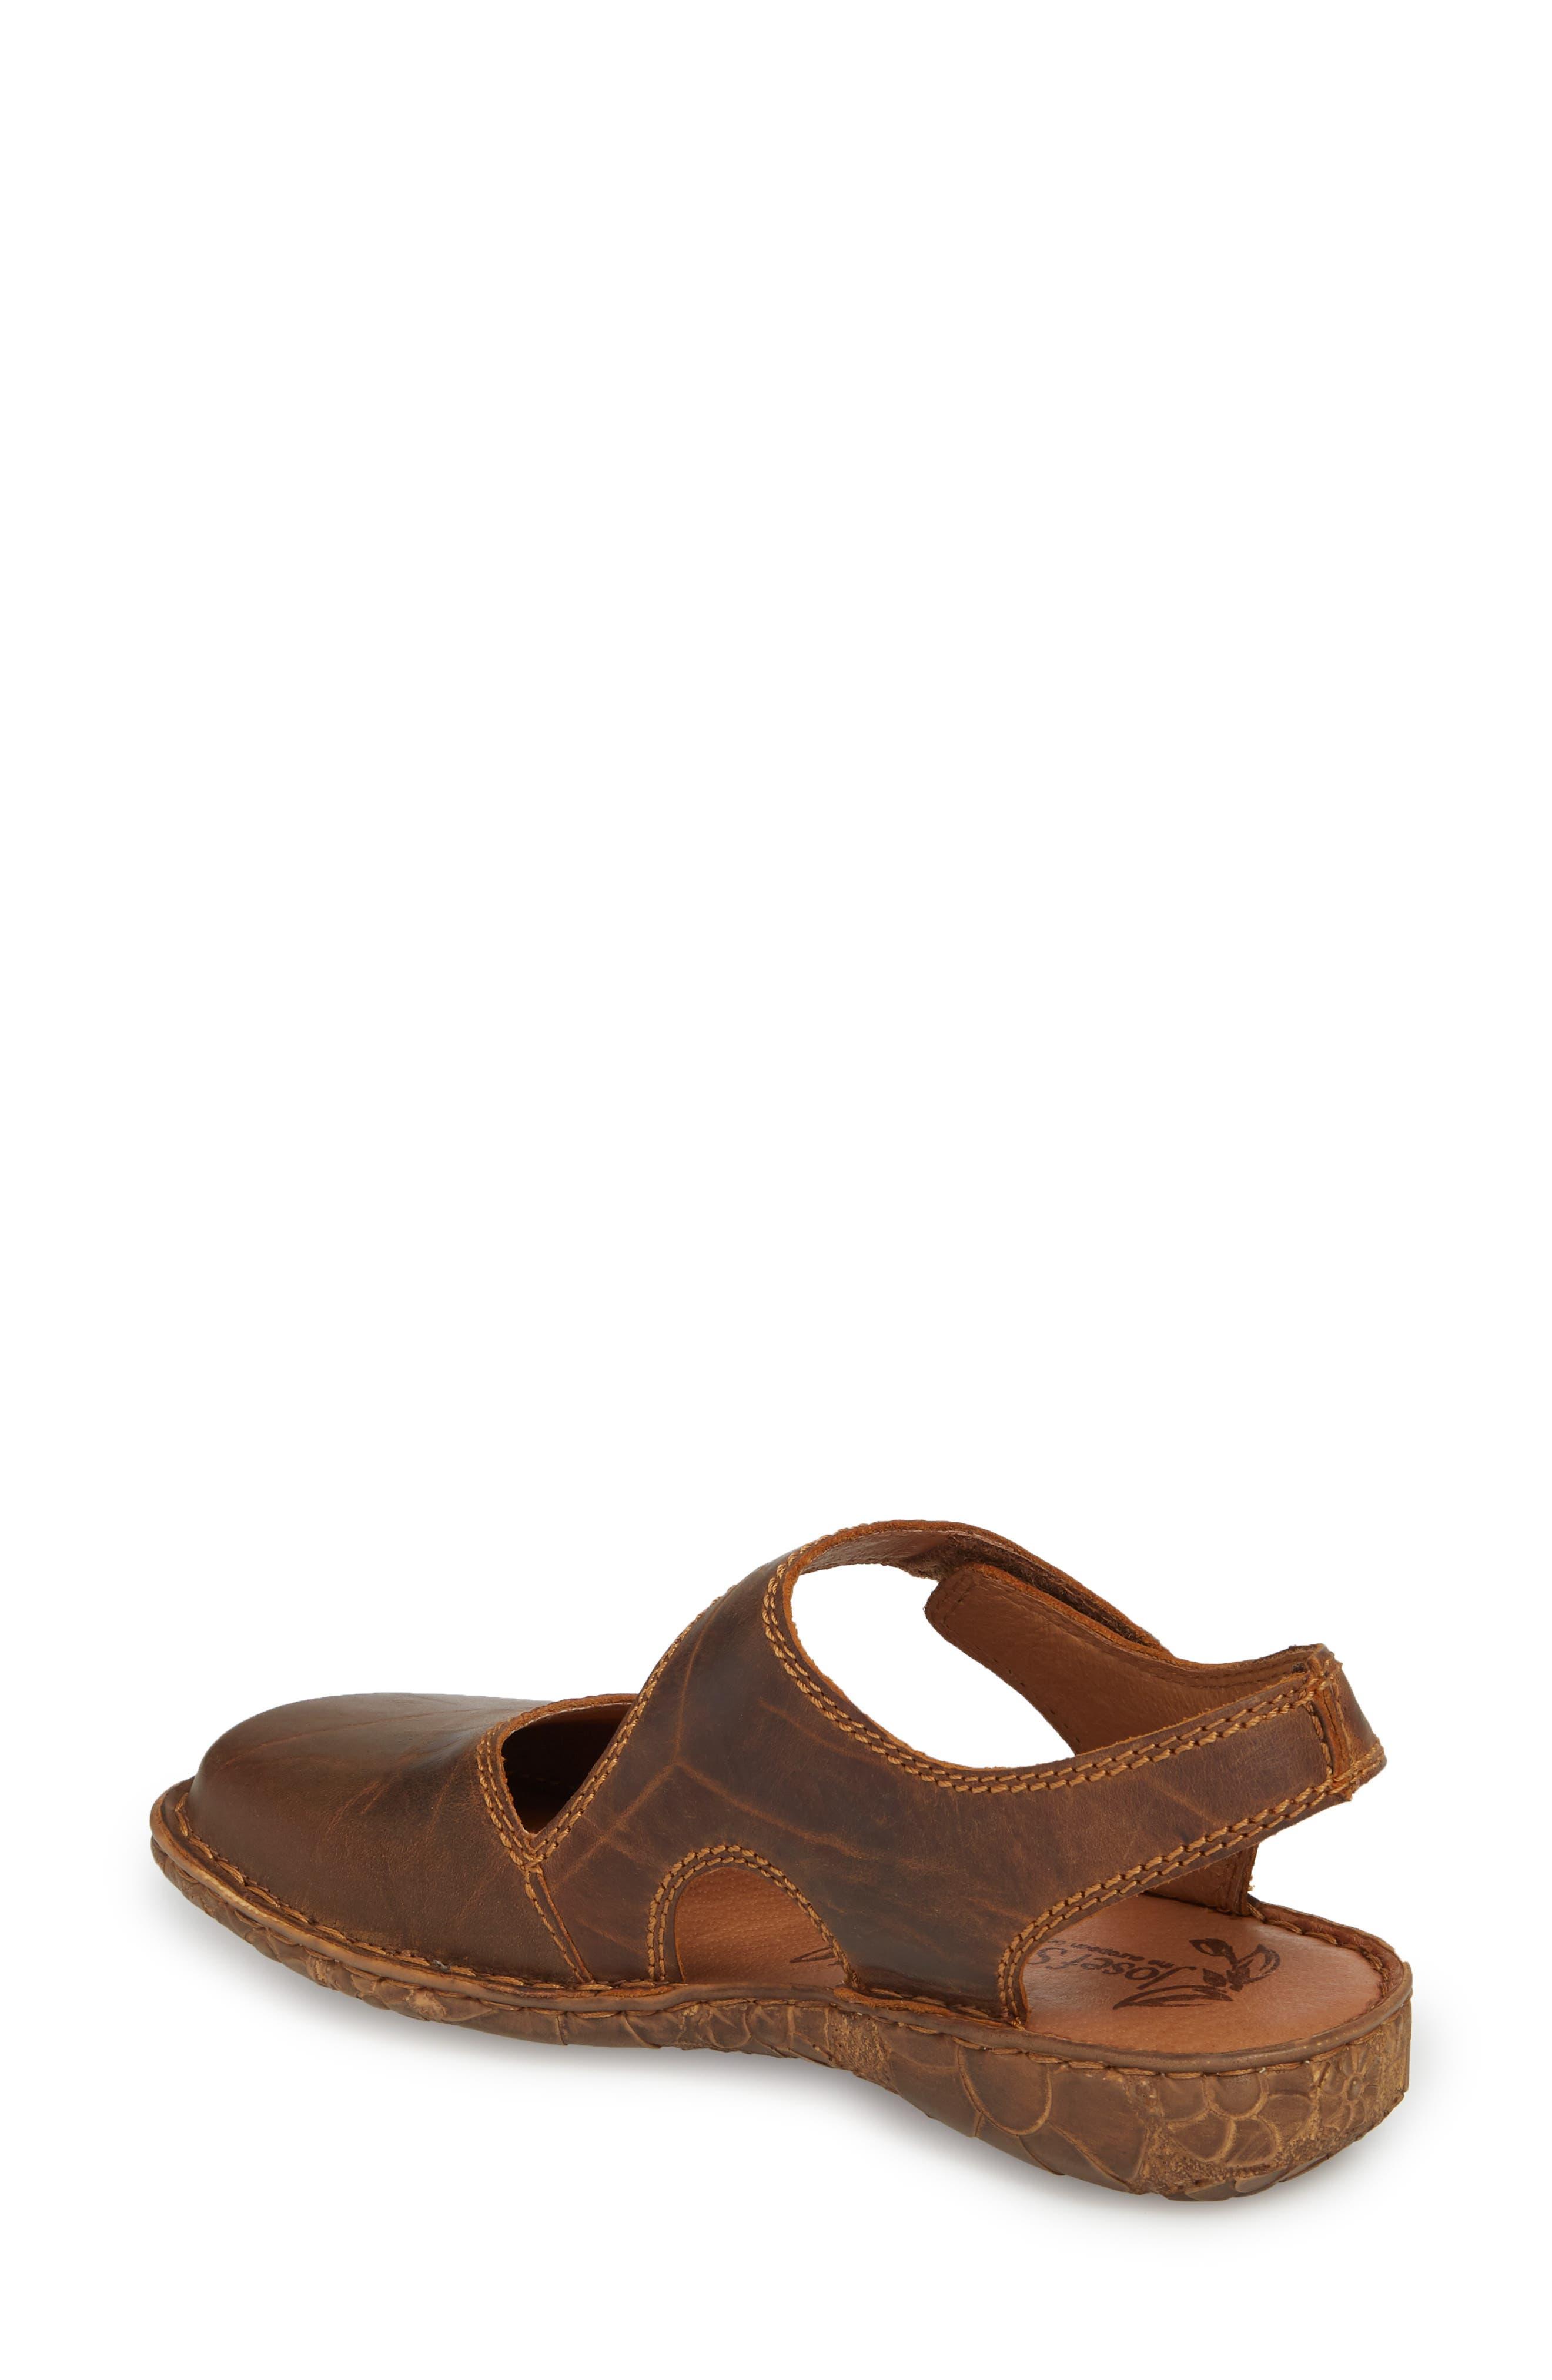 Rosalie 27 Sandal,                             Alternate thumbnail 2, color,                             Brandy Leather